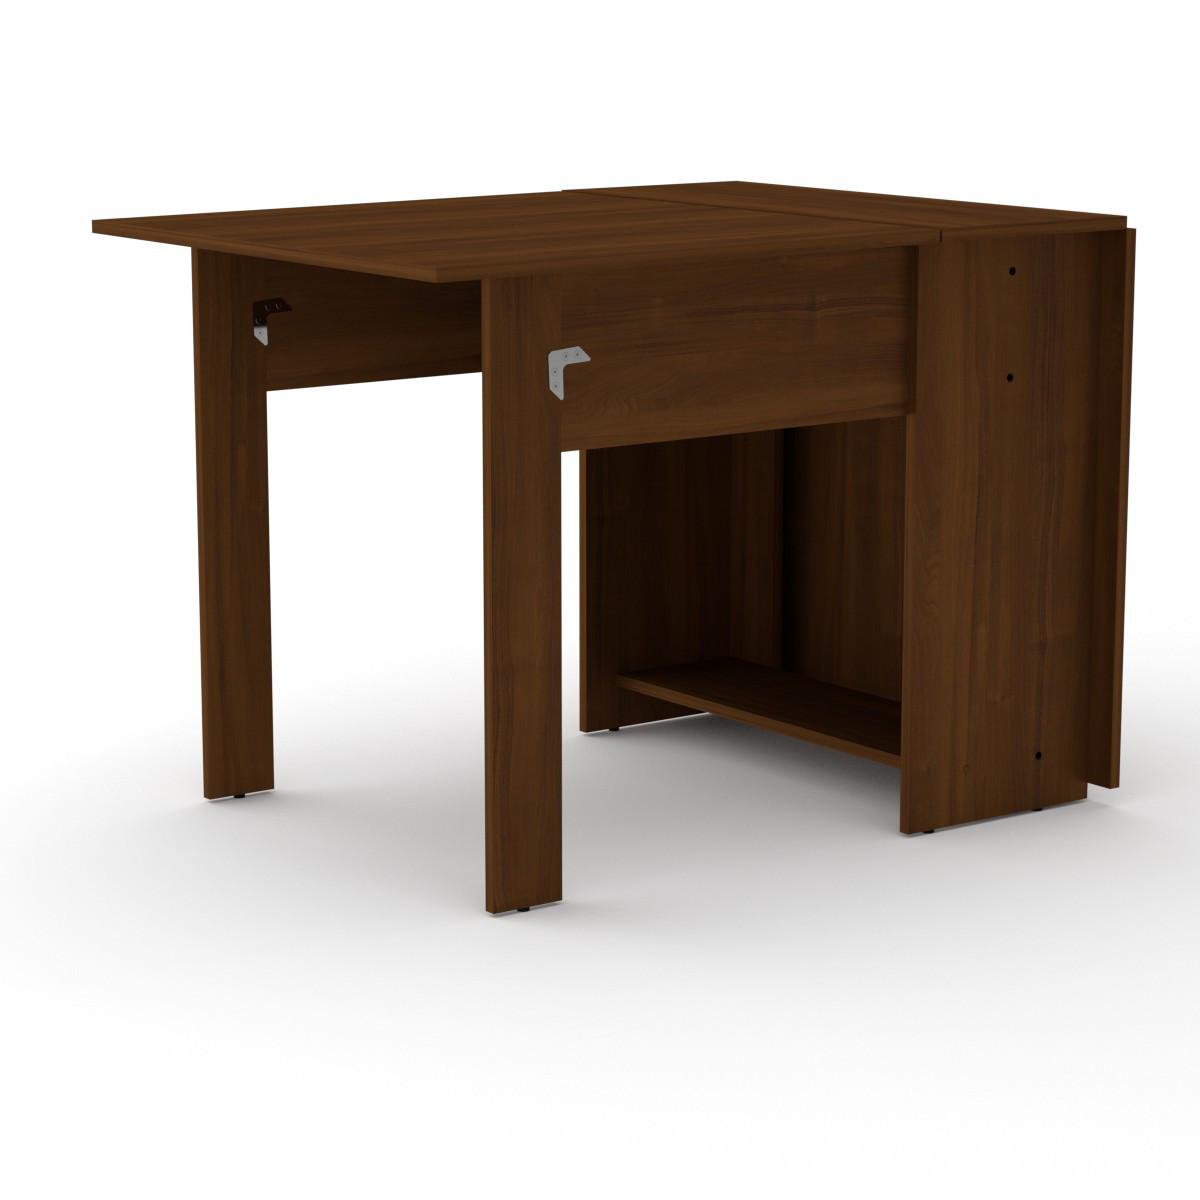 Стол книжка 1 орех экко Компанит (170х76х74 см)